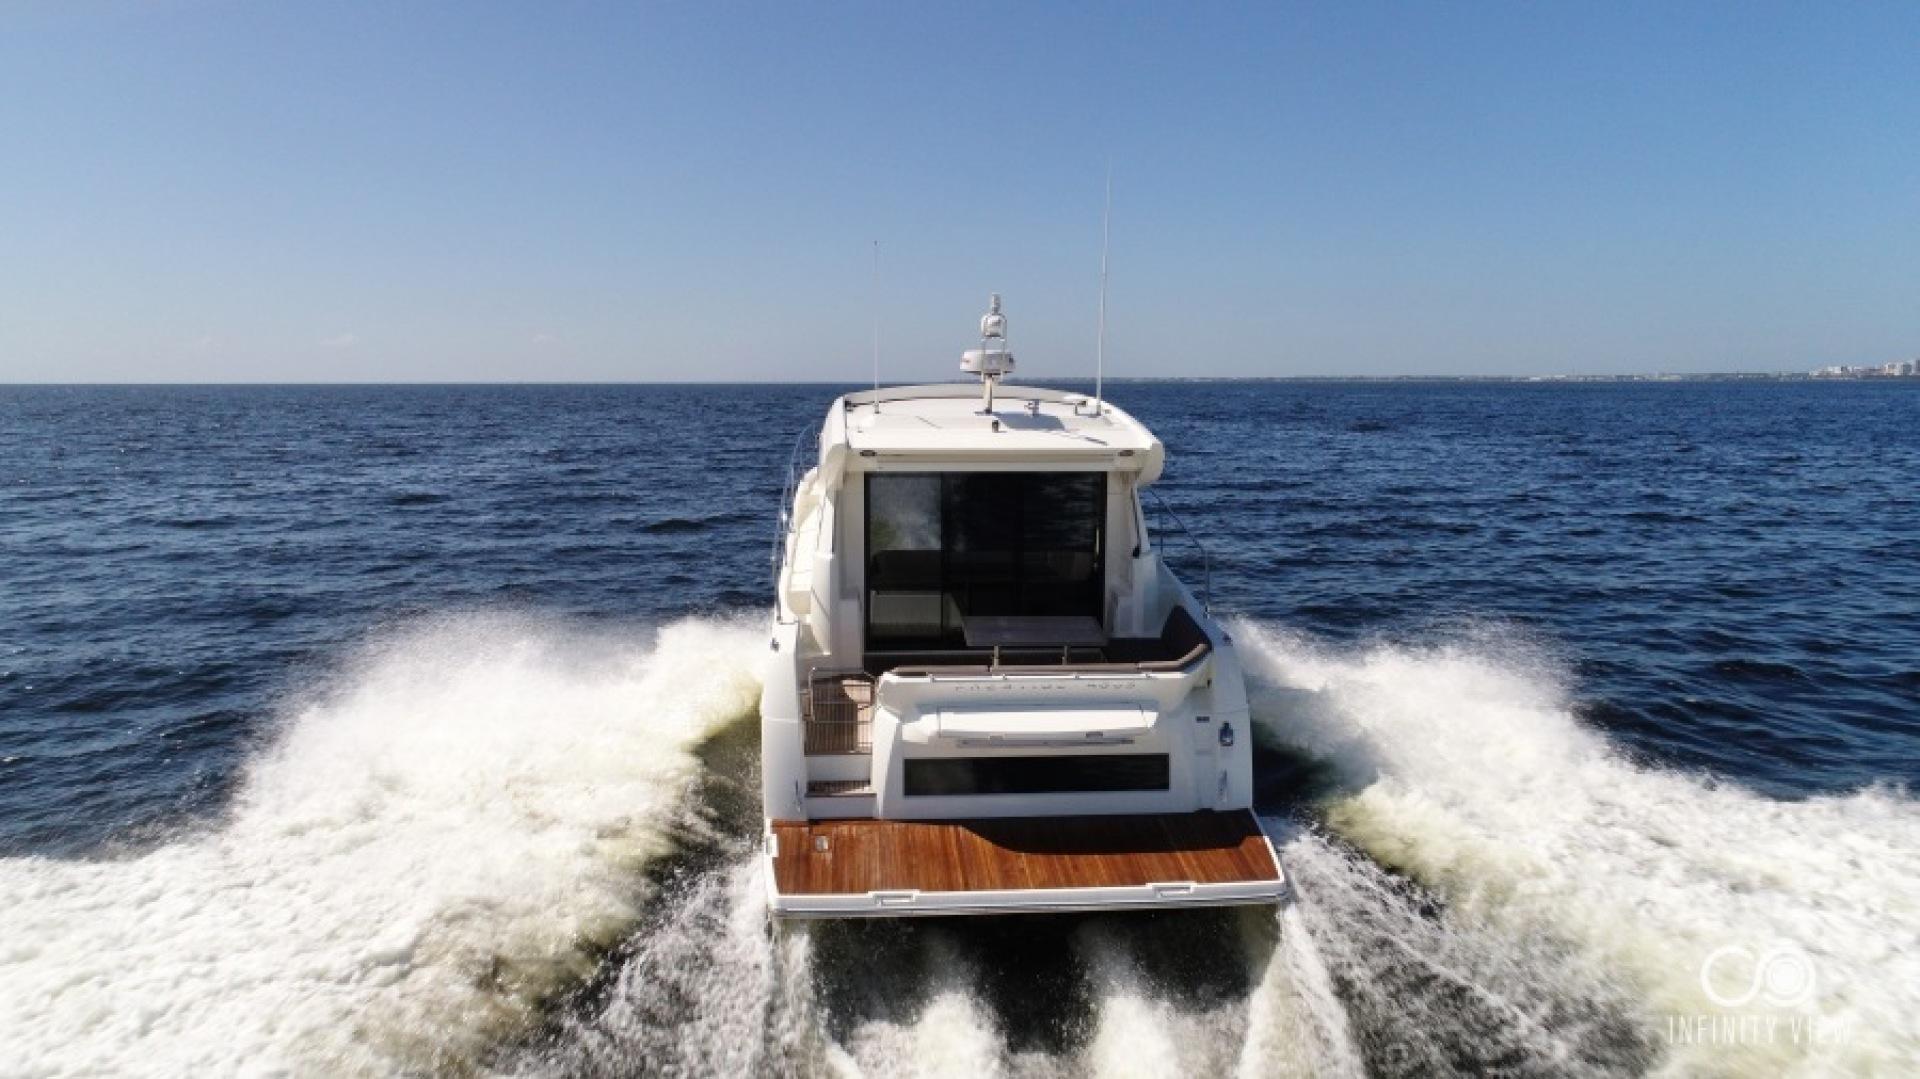 Prestige-460 S 2018-Unforgettable St Petersburg-Florida-United States-2018 Prestige 460 S Yacht  Unforgettable  Running Profile-1444308   Thumbnail